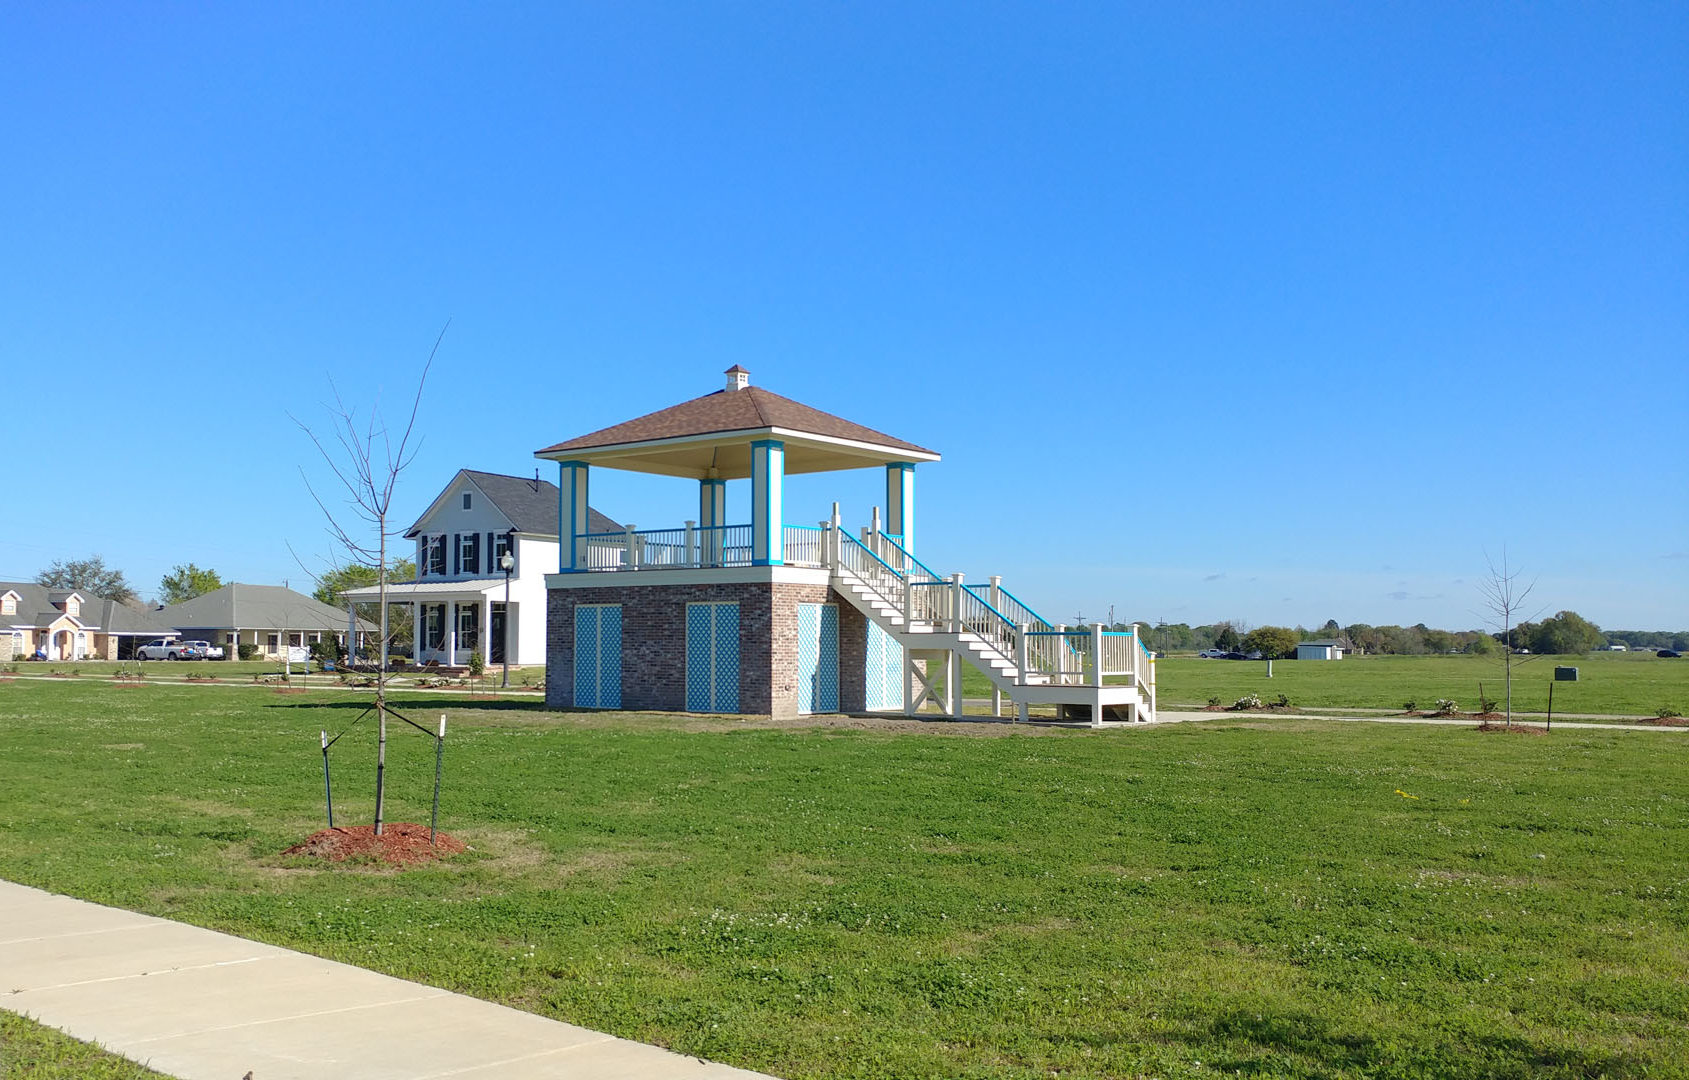 Pavilion Update